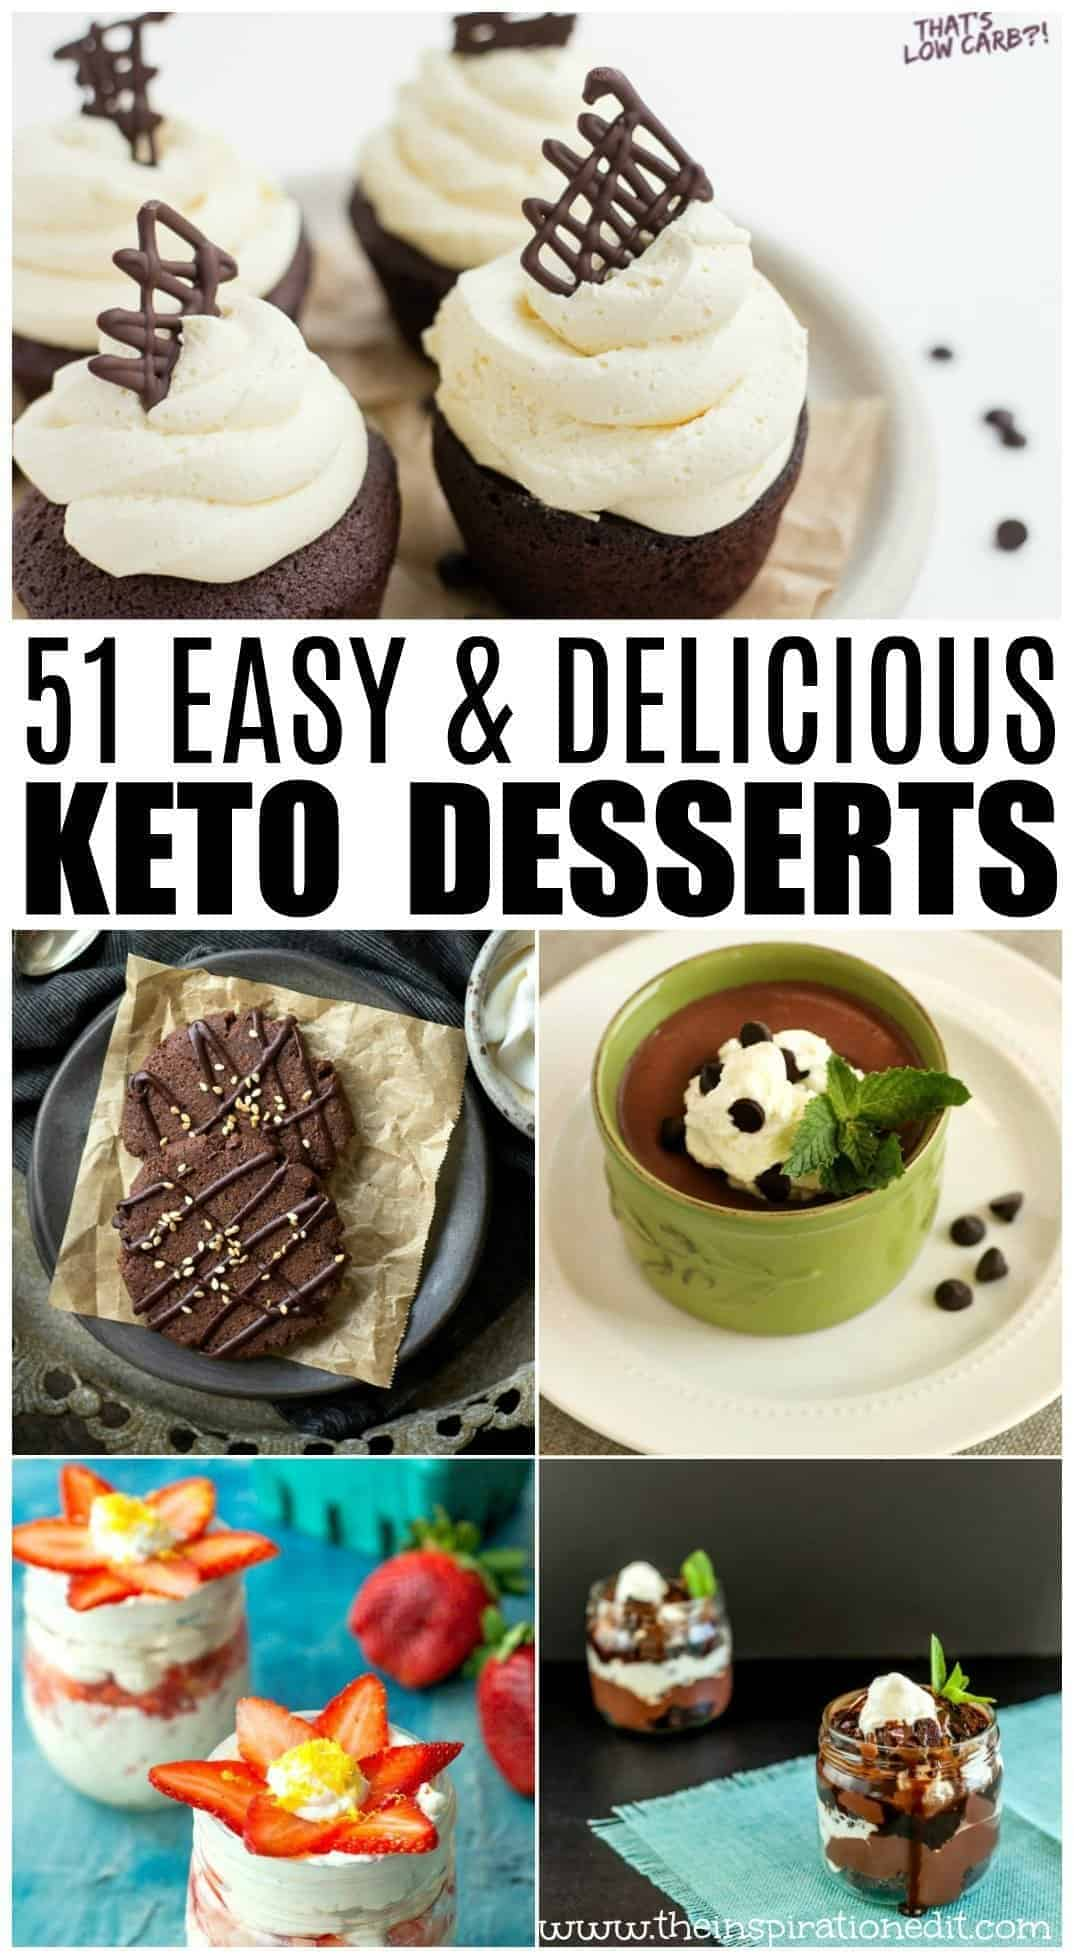 keto dessert ideas you will love today